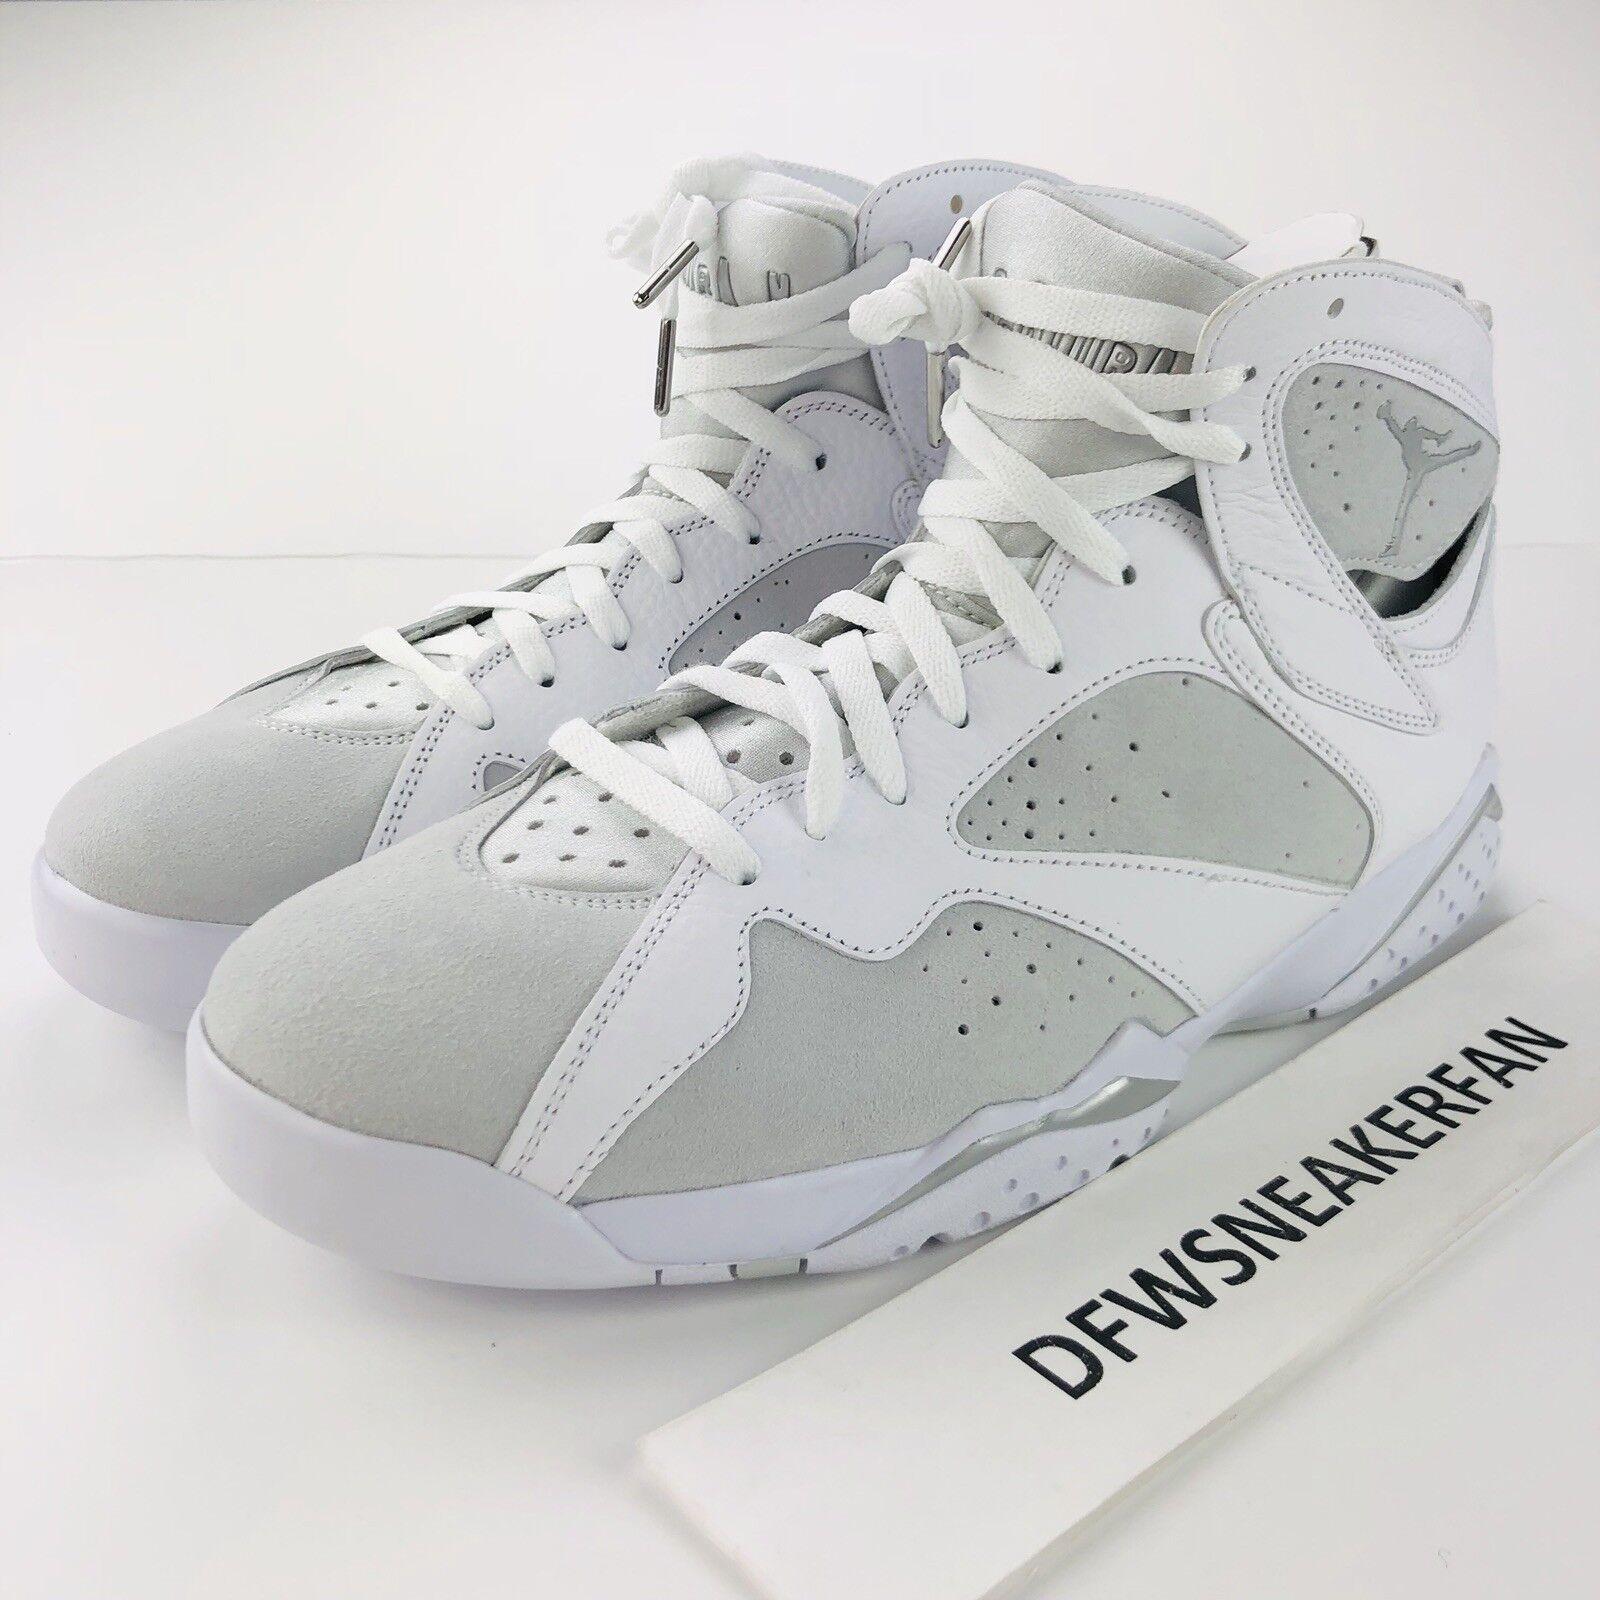 Nike Air Jordan VII 7 7 7 Retro Herren Größe 10 Pure Geld Platin 304775-120 Neu 88a93e